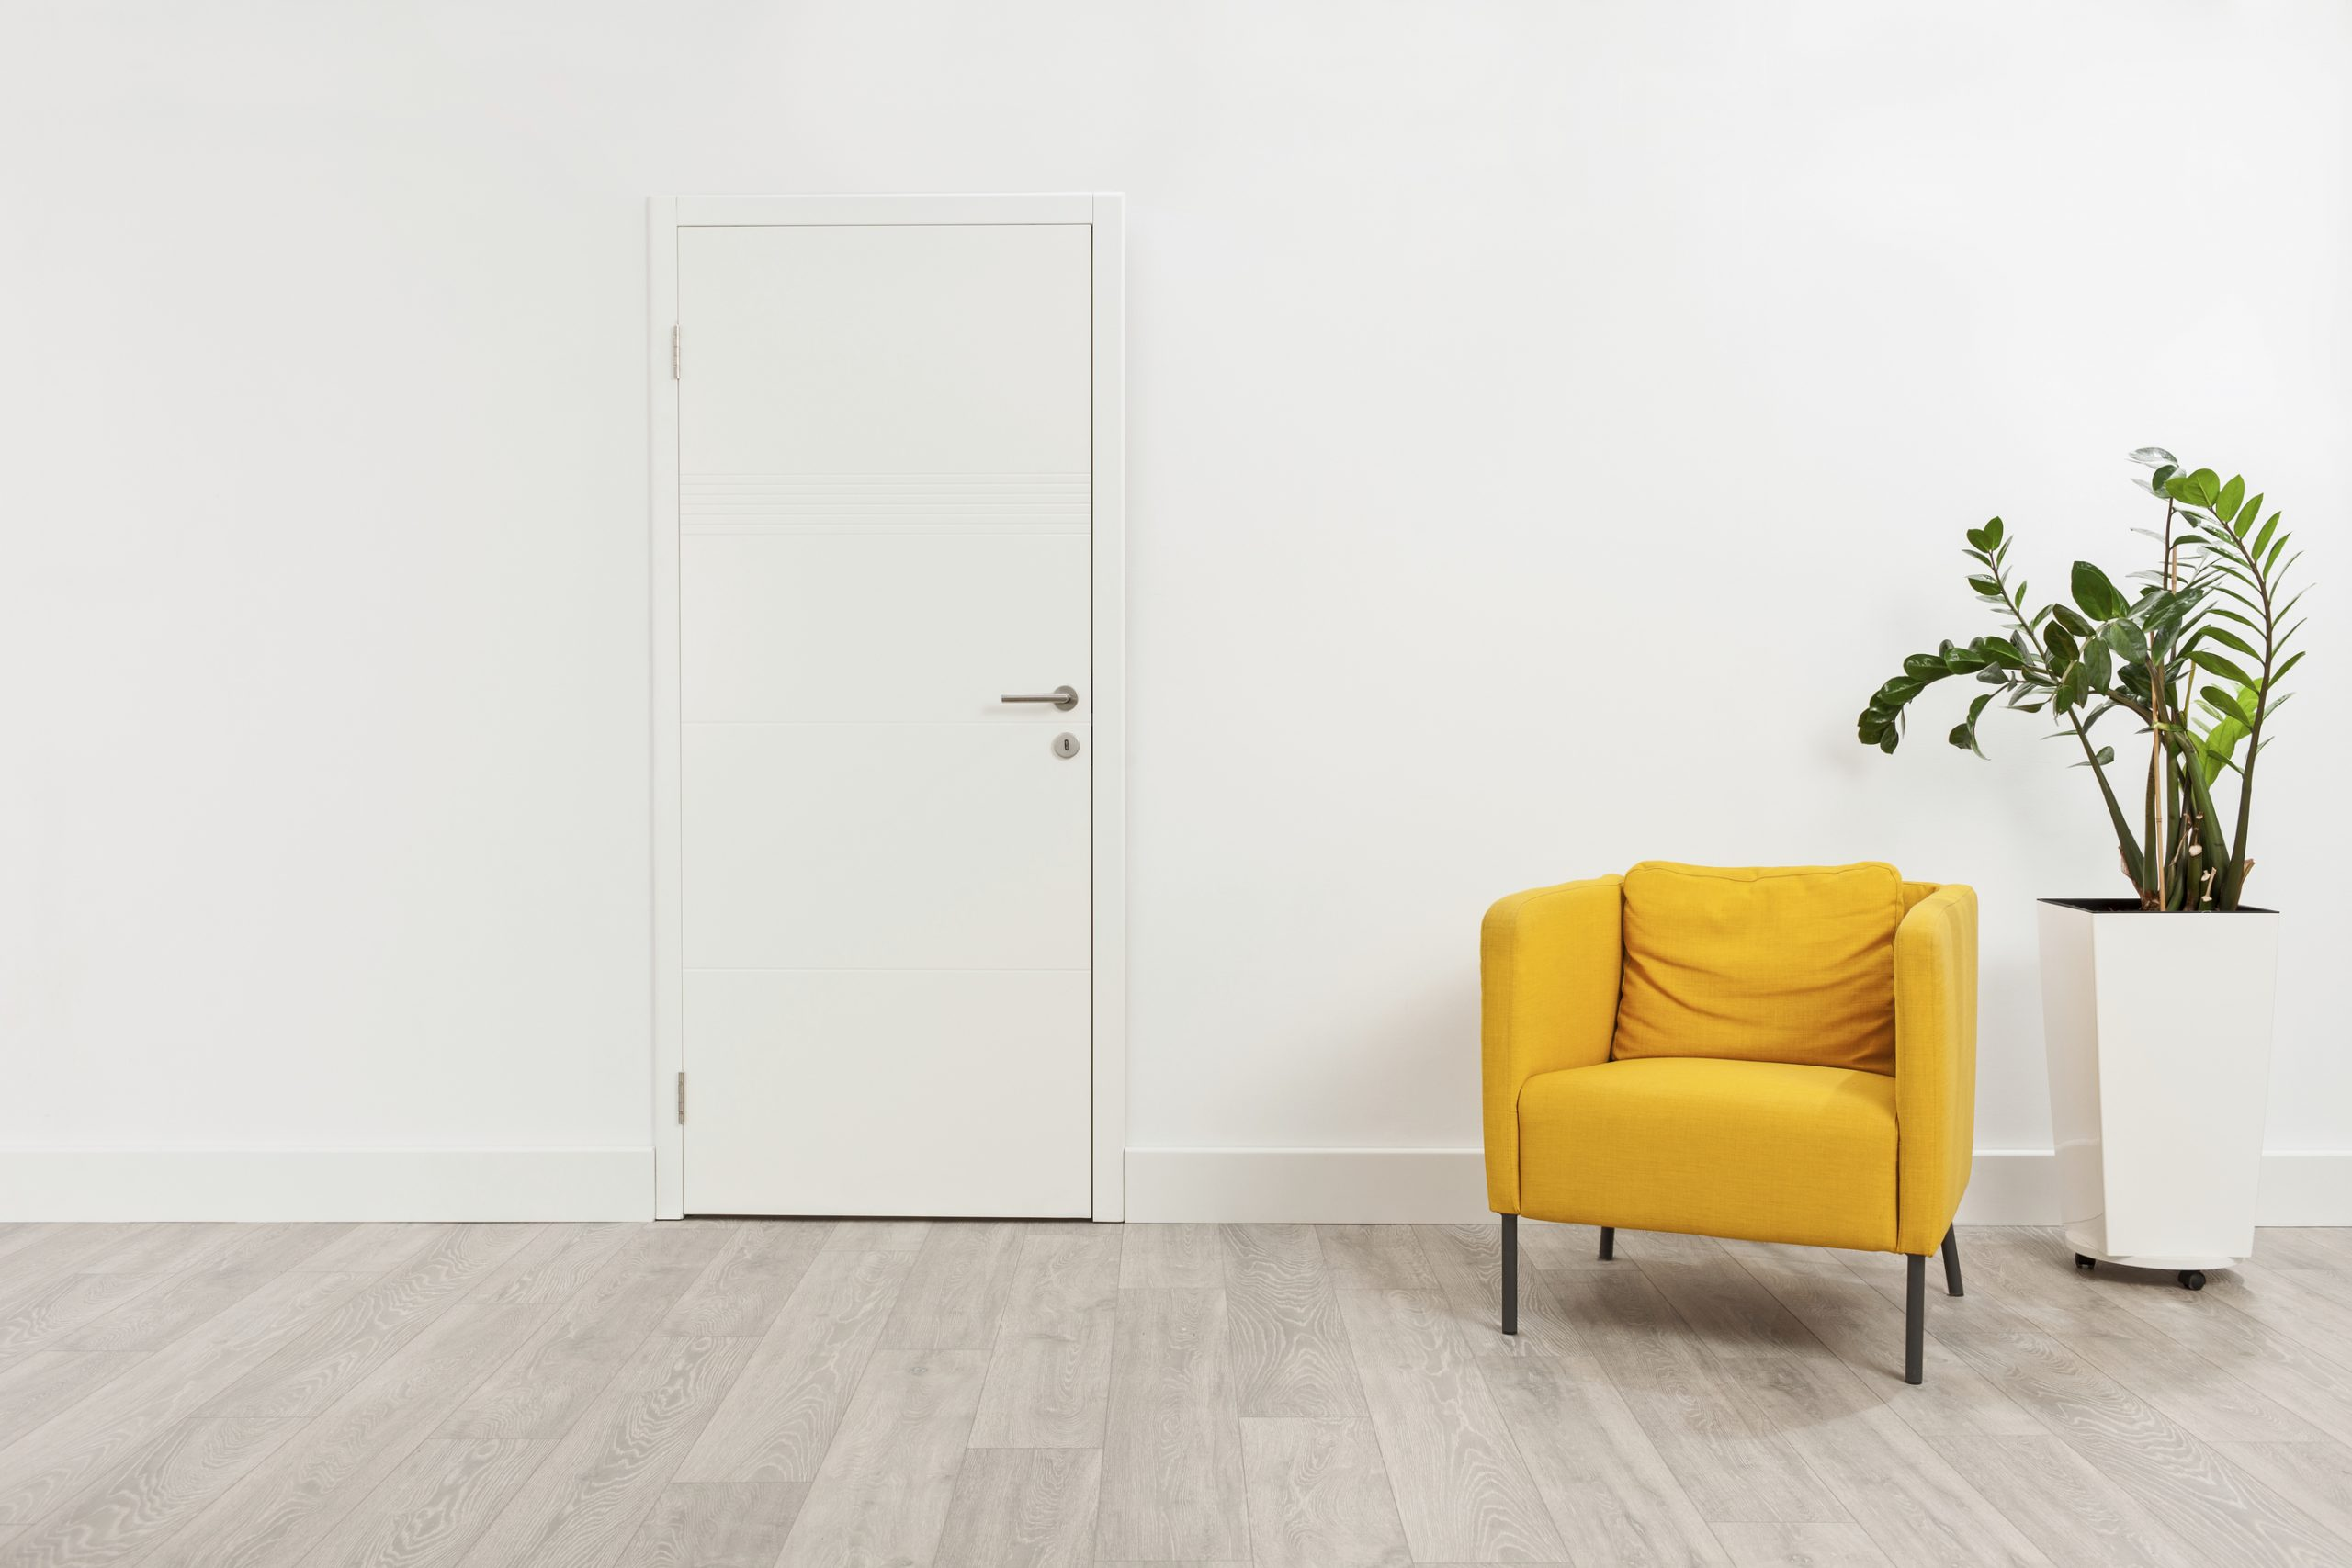 Vinyl Flooring with Yellow Chair